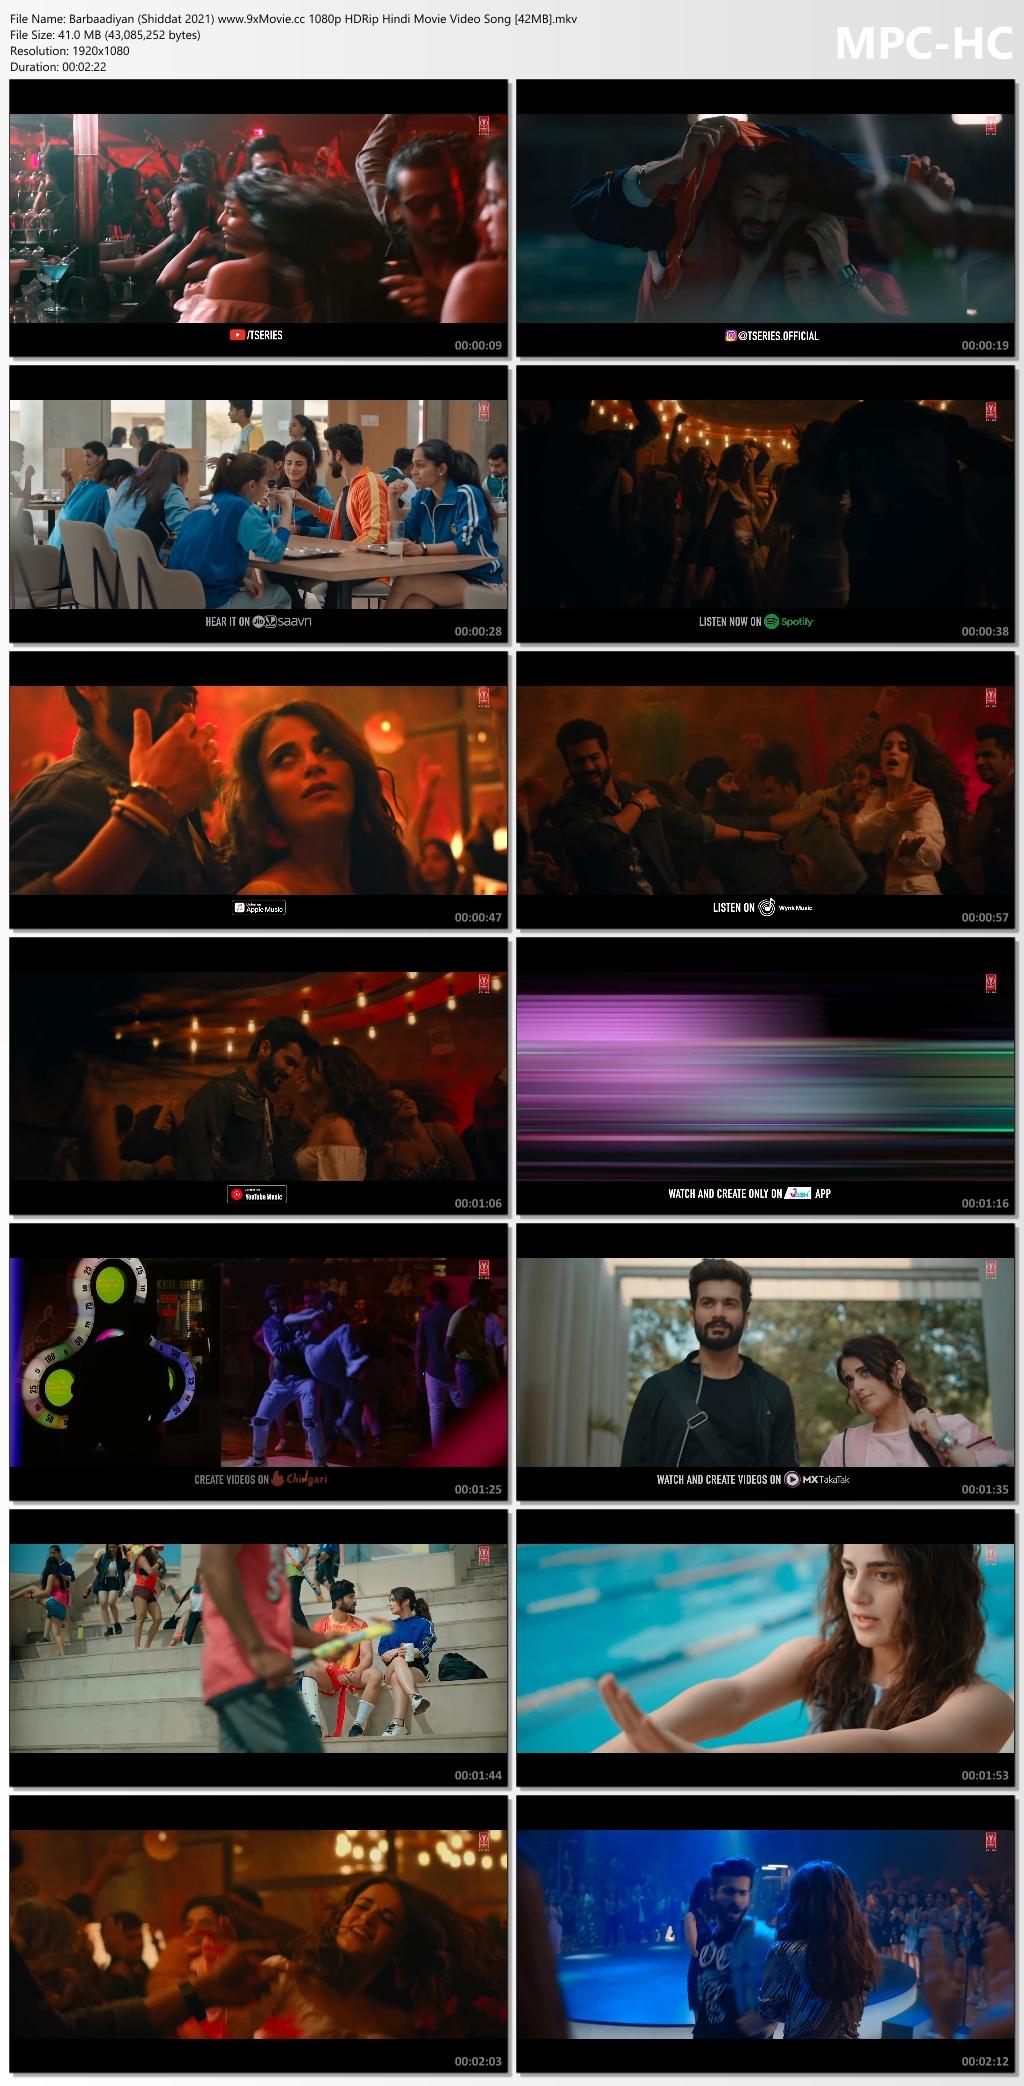 Barbaadiyan-Shiddat-2021-www-9x-Movie-cc-1080p-HDRip-Hindi-Movie-Video-Song-42-MB-mkv